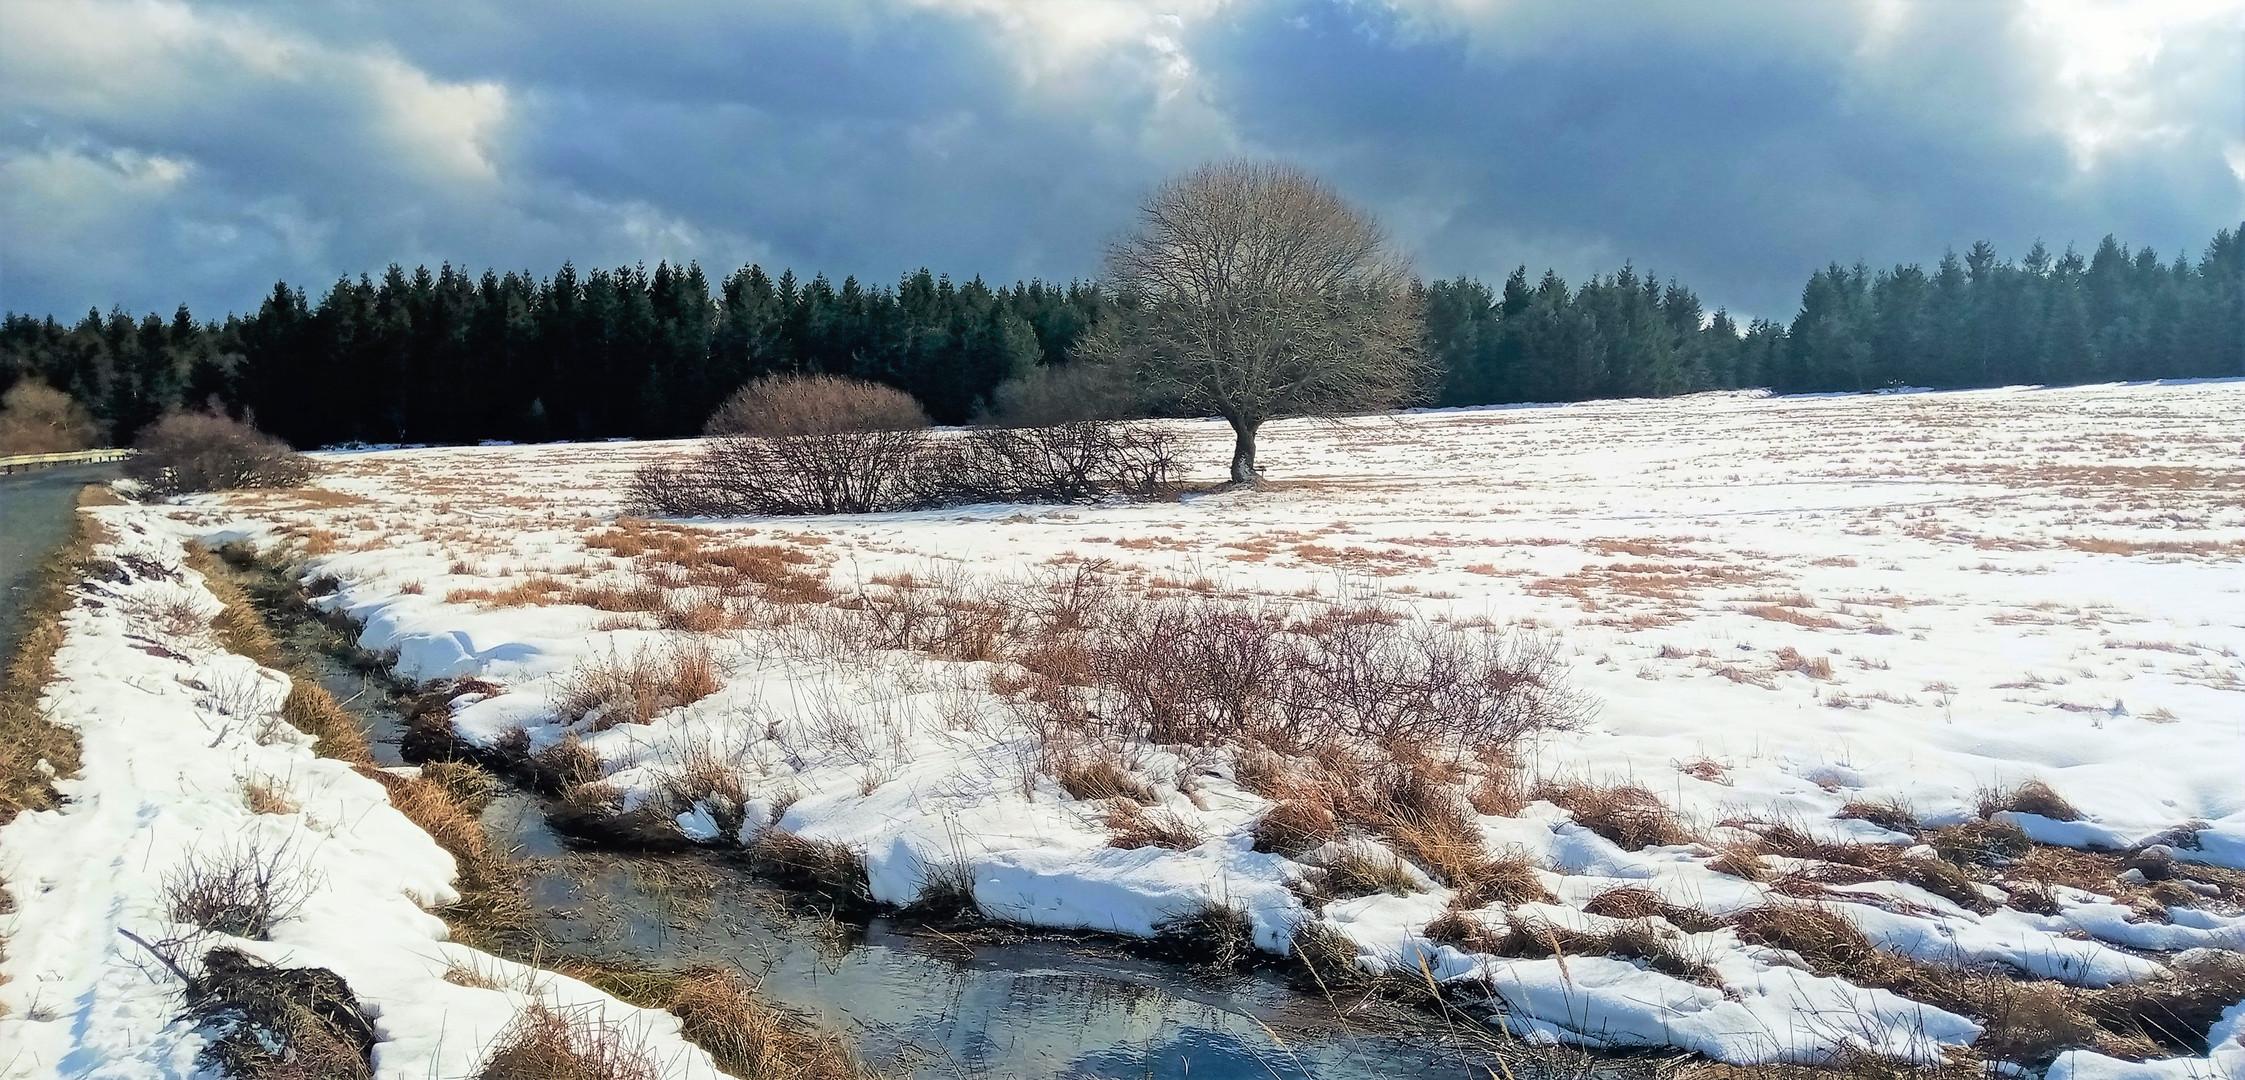 Galerie: Rašeliniště Cínoveckého hřbetu